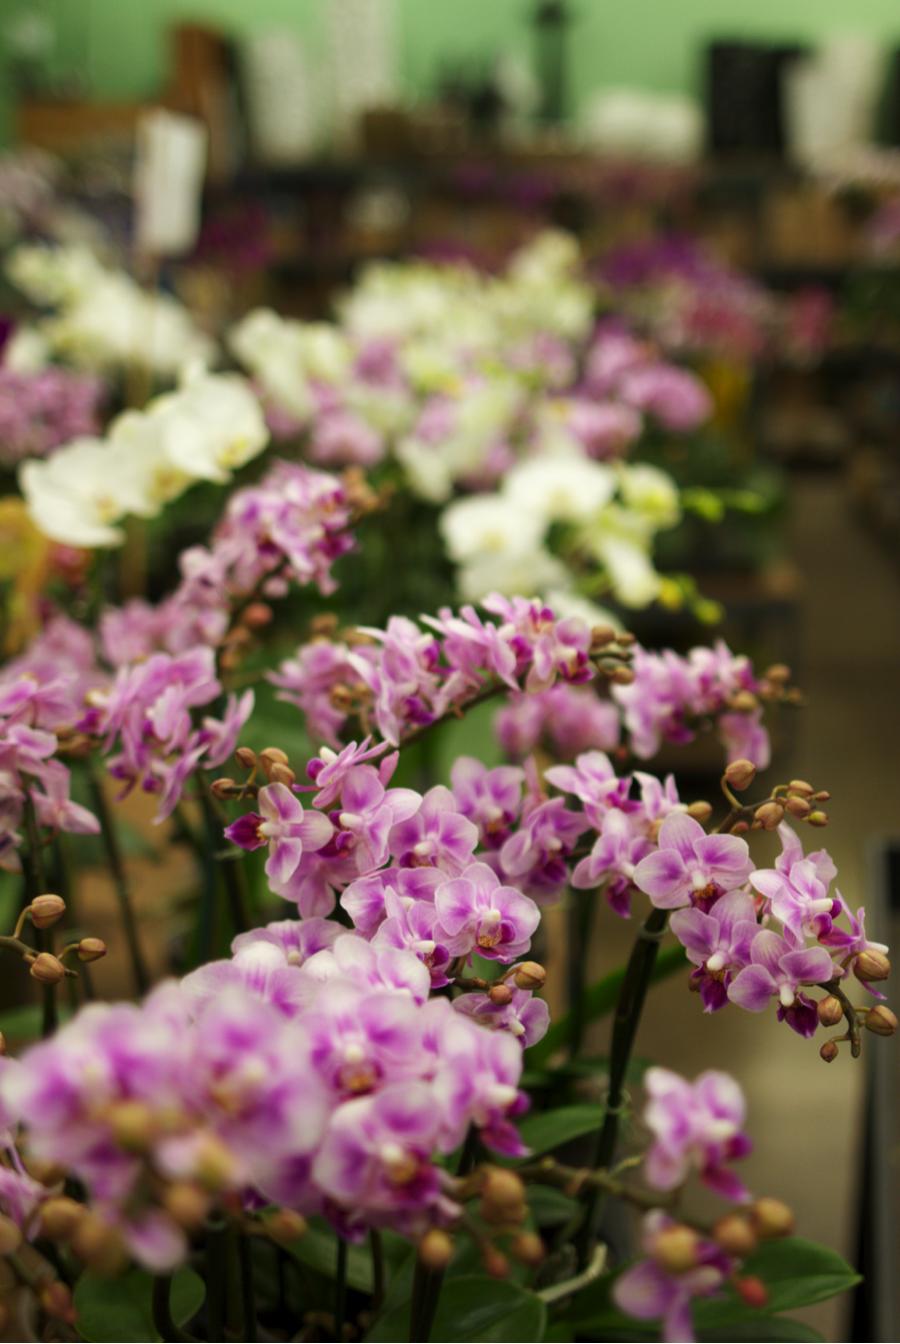 _03_BBG the Orchid Man - The Orchid Man  - Bangkok Botanical Garden_04.png